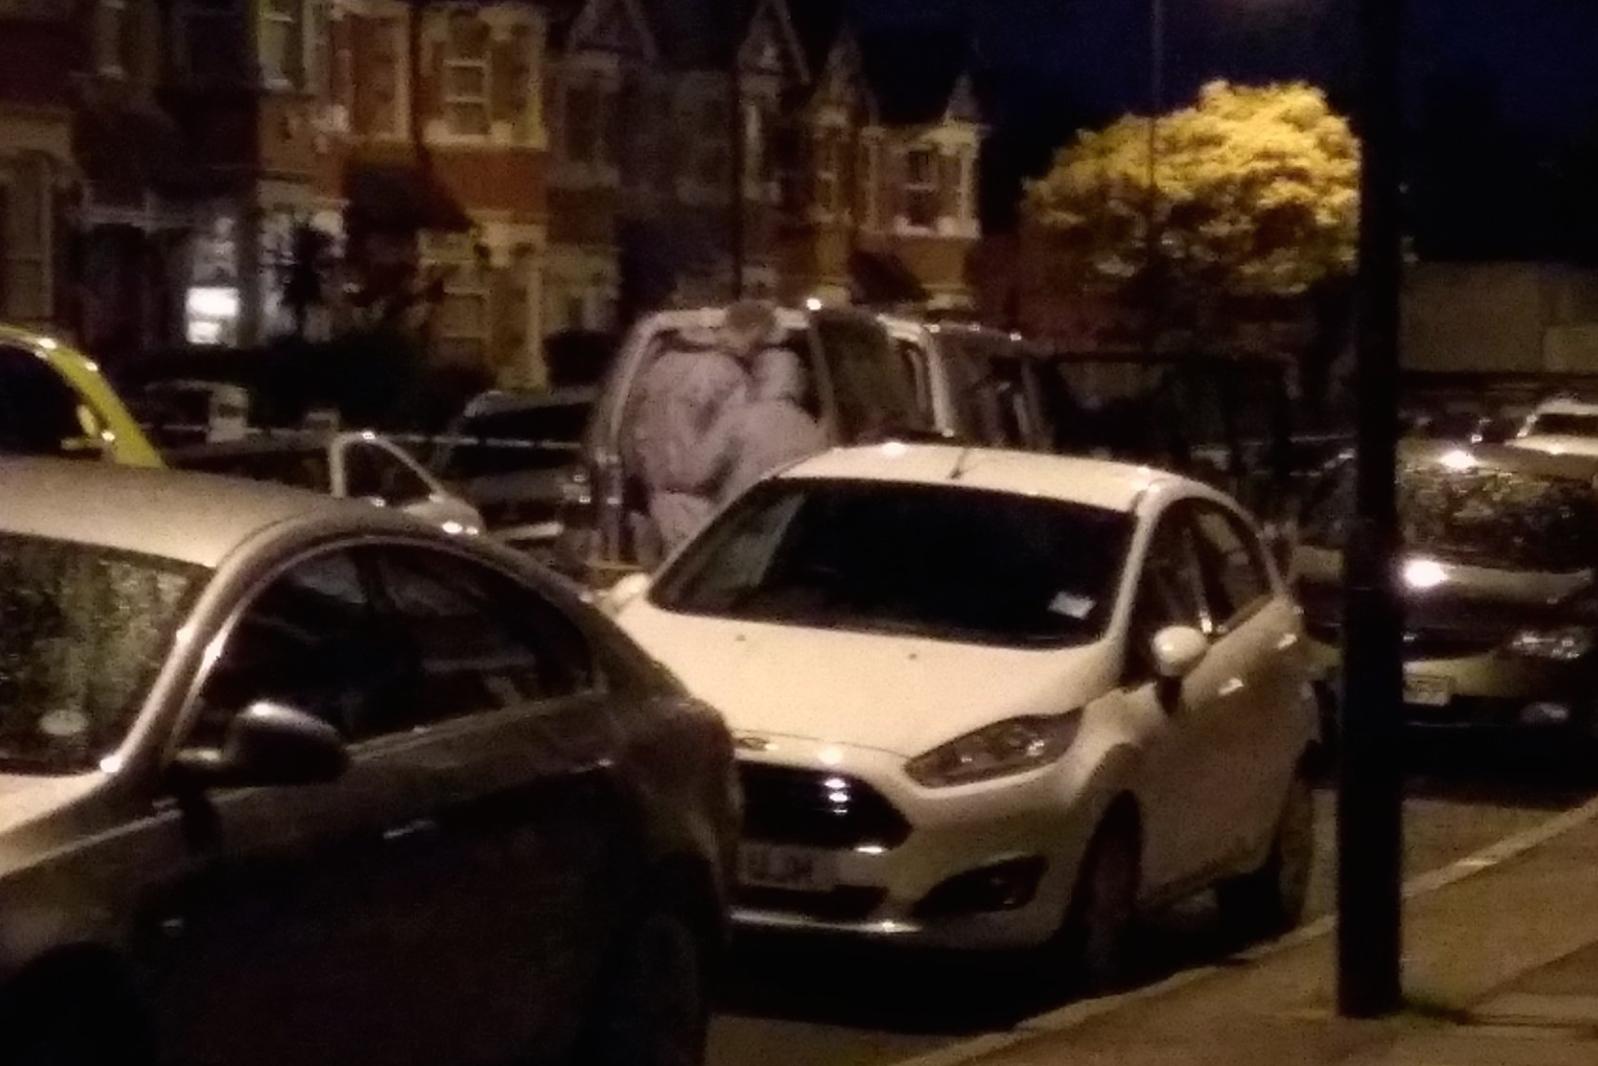 Willesden anti-terror raid